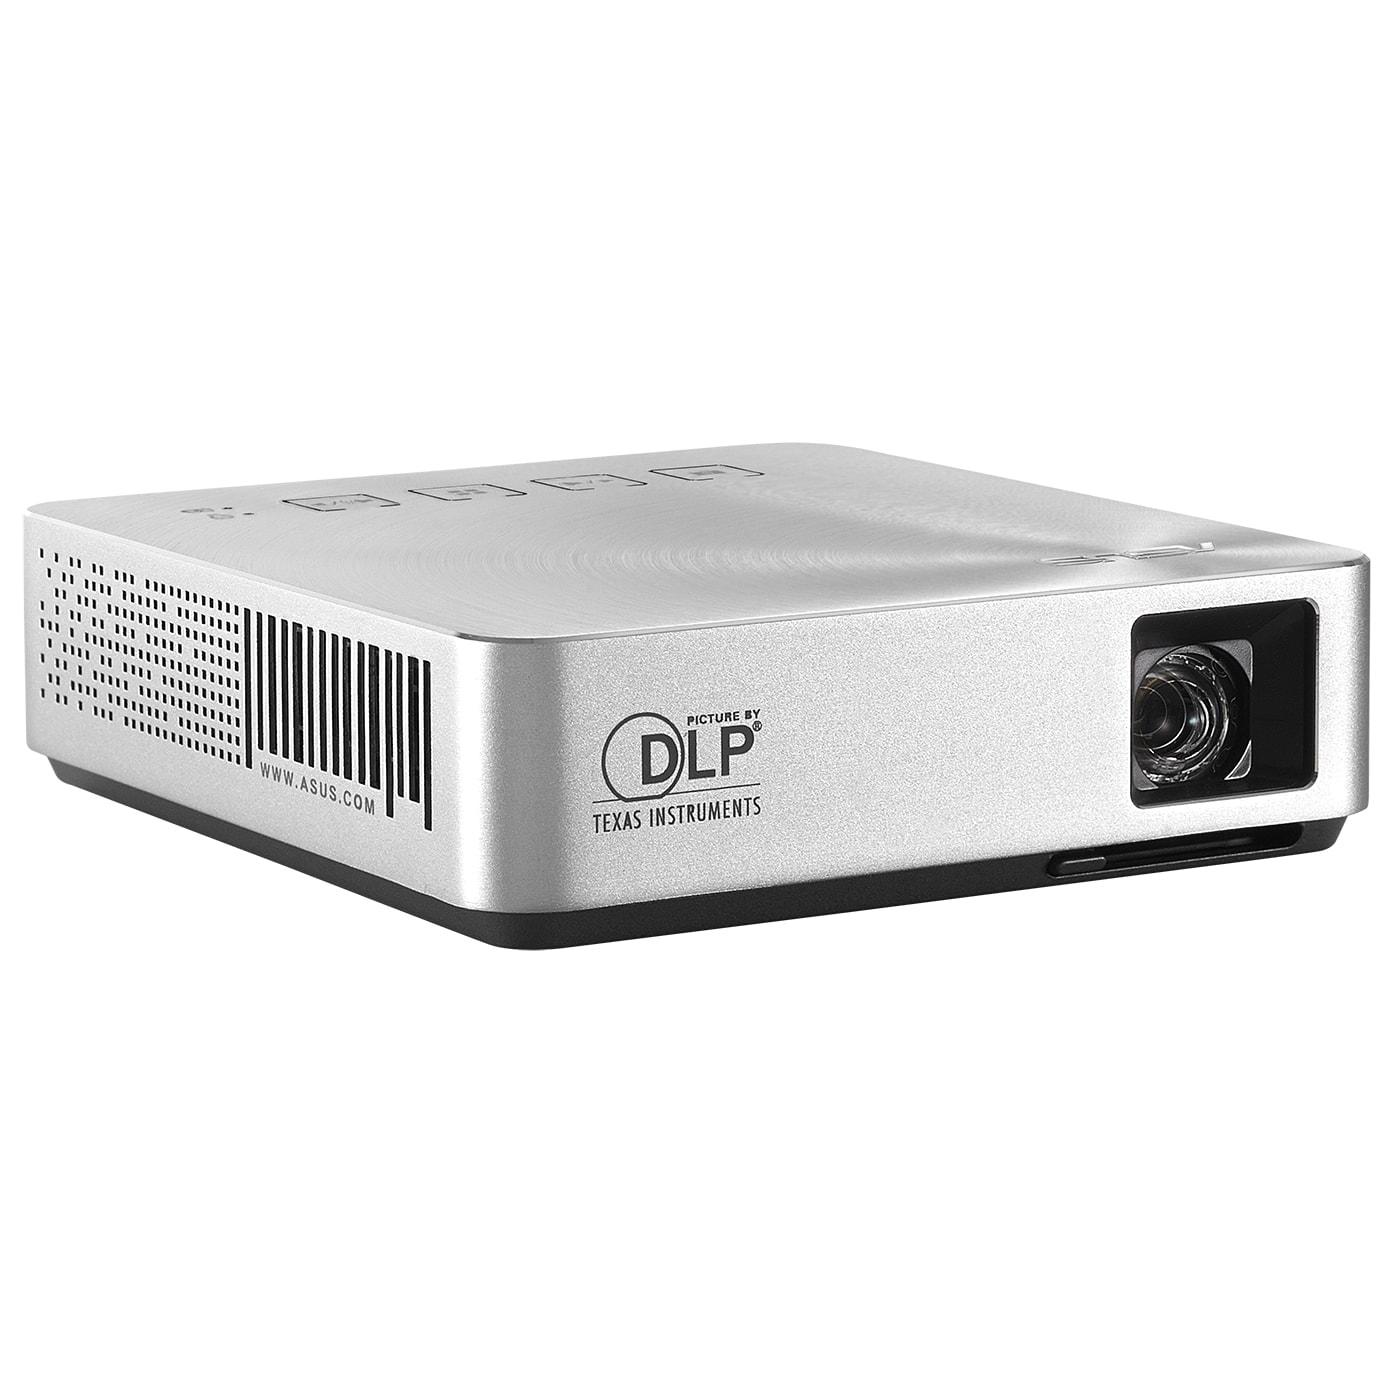 Asus S1 - Vidéoprojecteur Asus - Cybertek.fr - 0